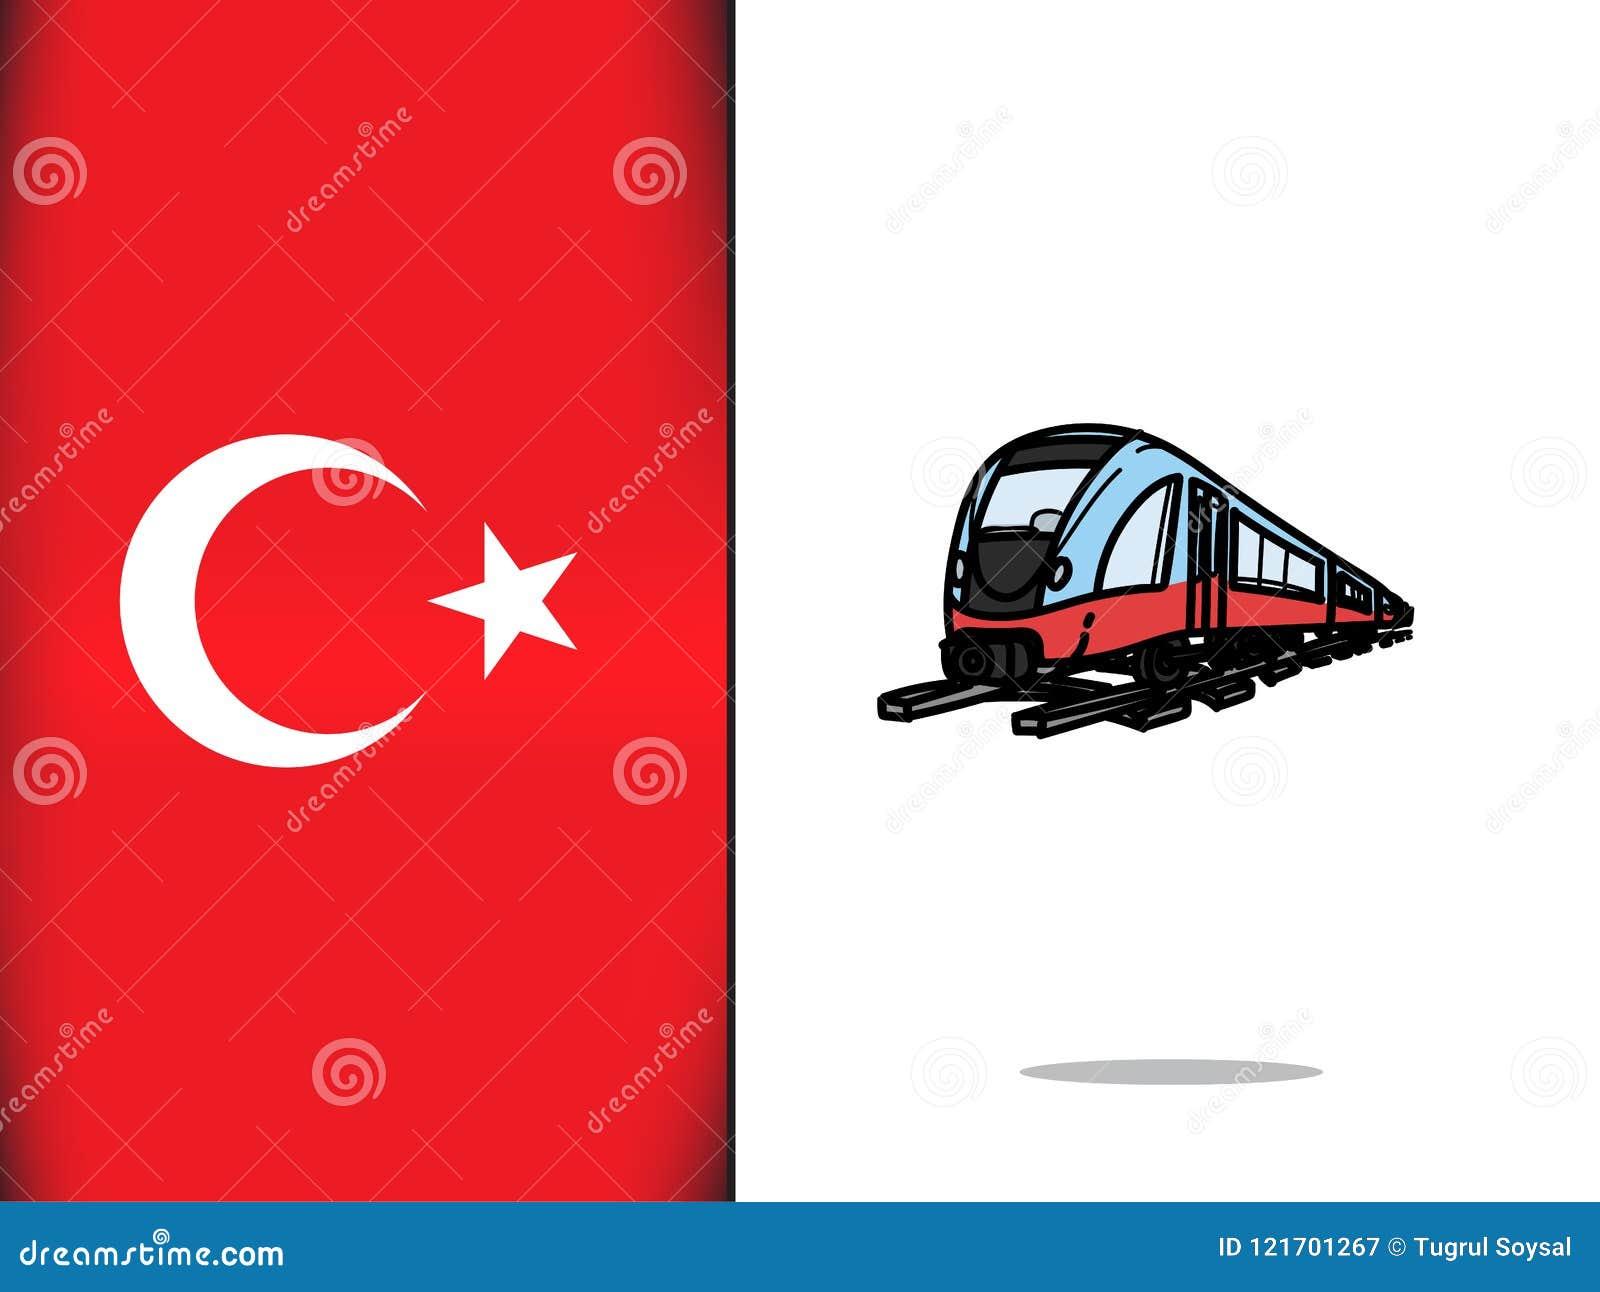 Turkish Culture For Train Icon Stock Illustration - Illustration of